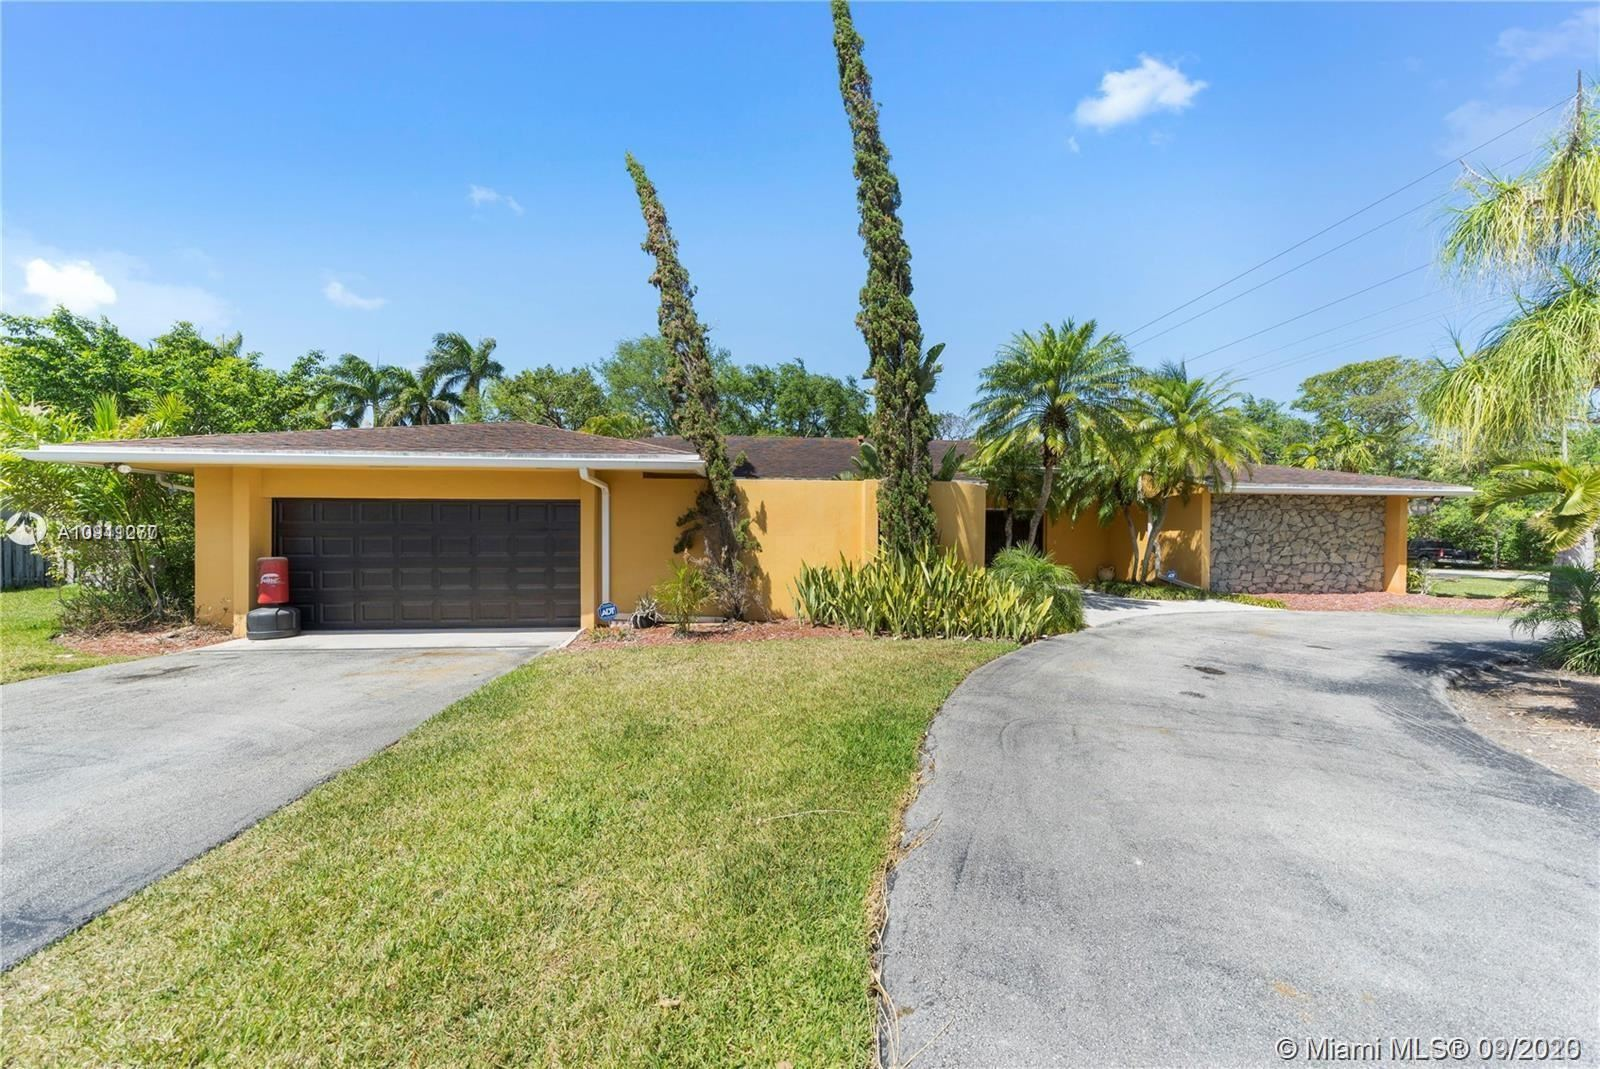 8201 SW 183rd St, Palmetto Bay, FL 33157 - #: A10911277